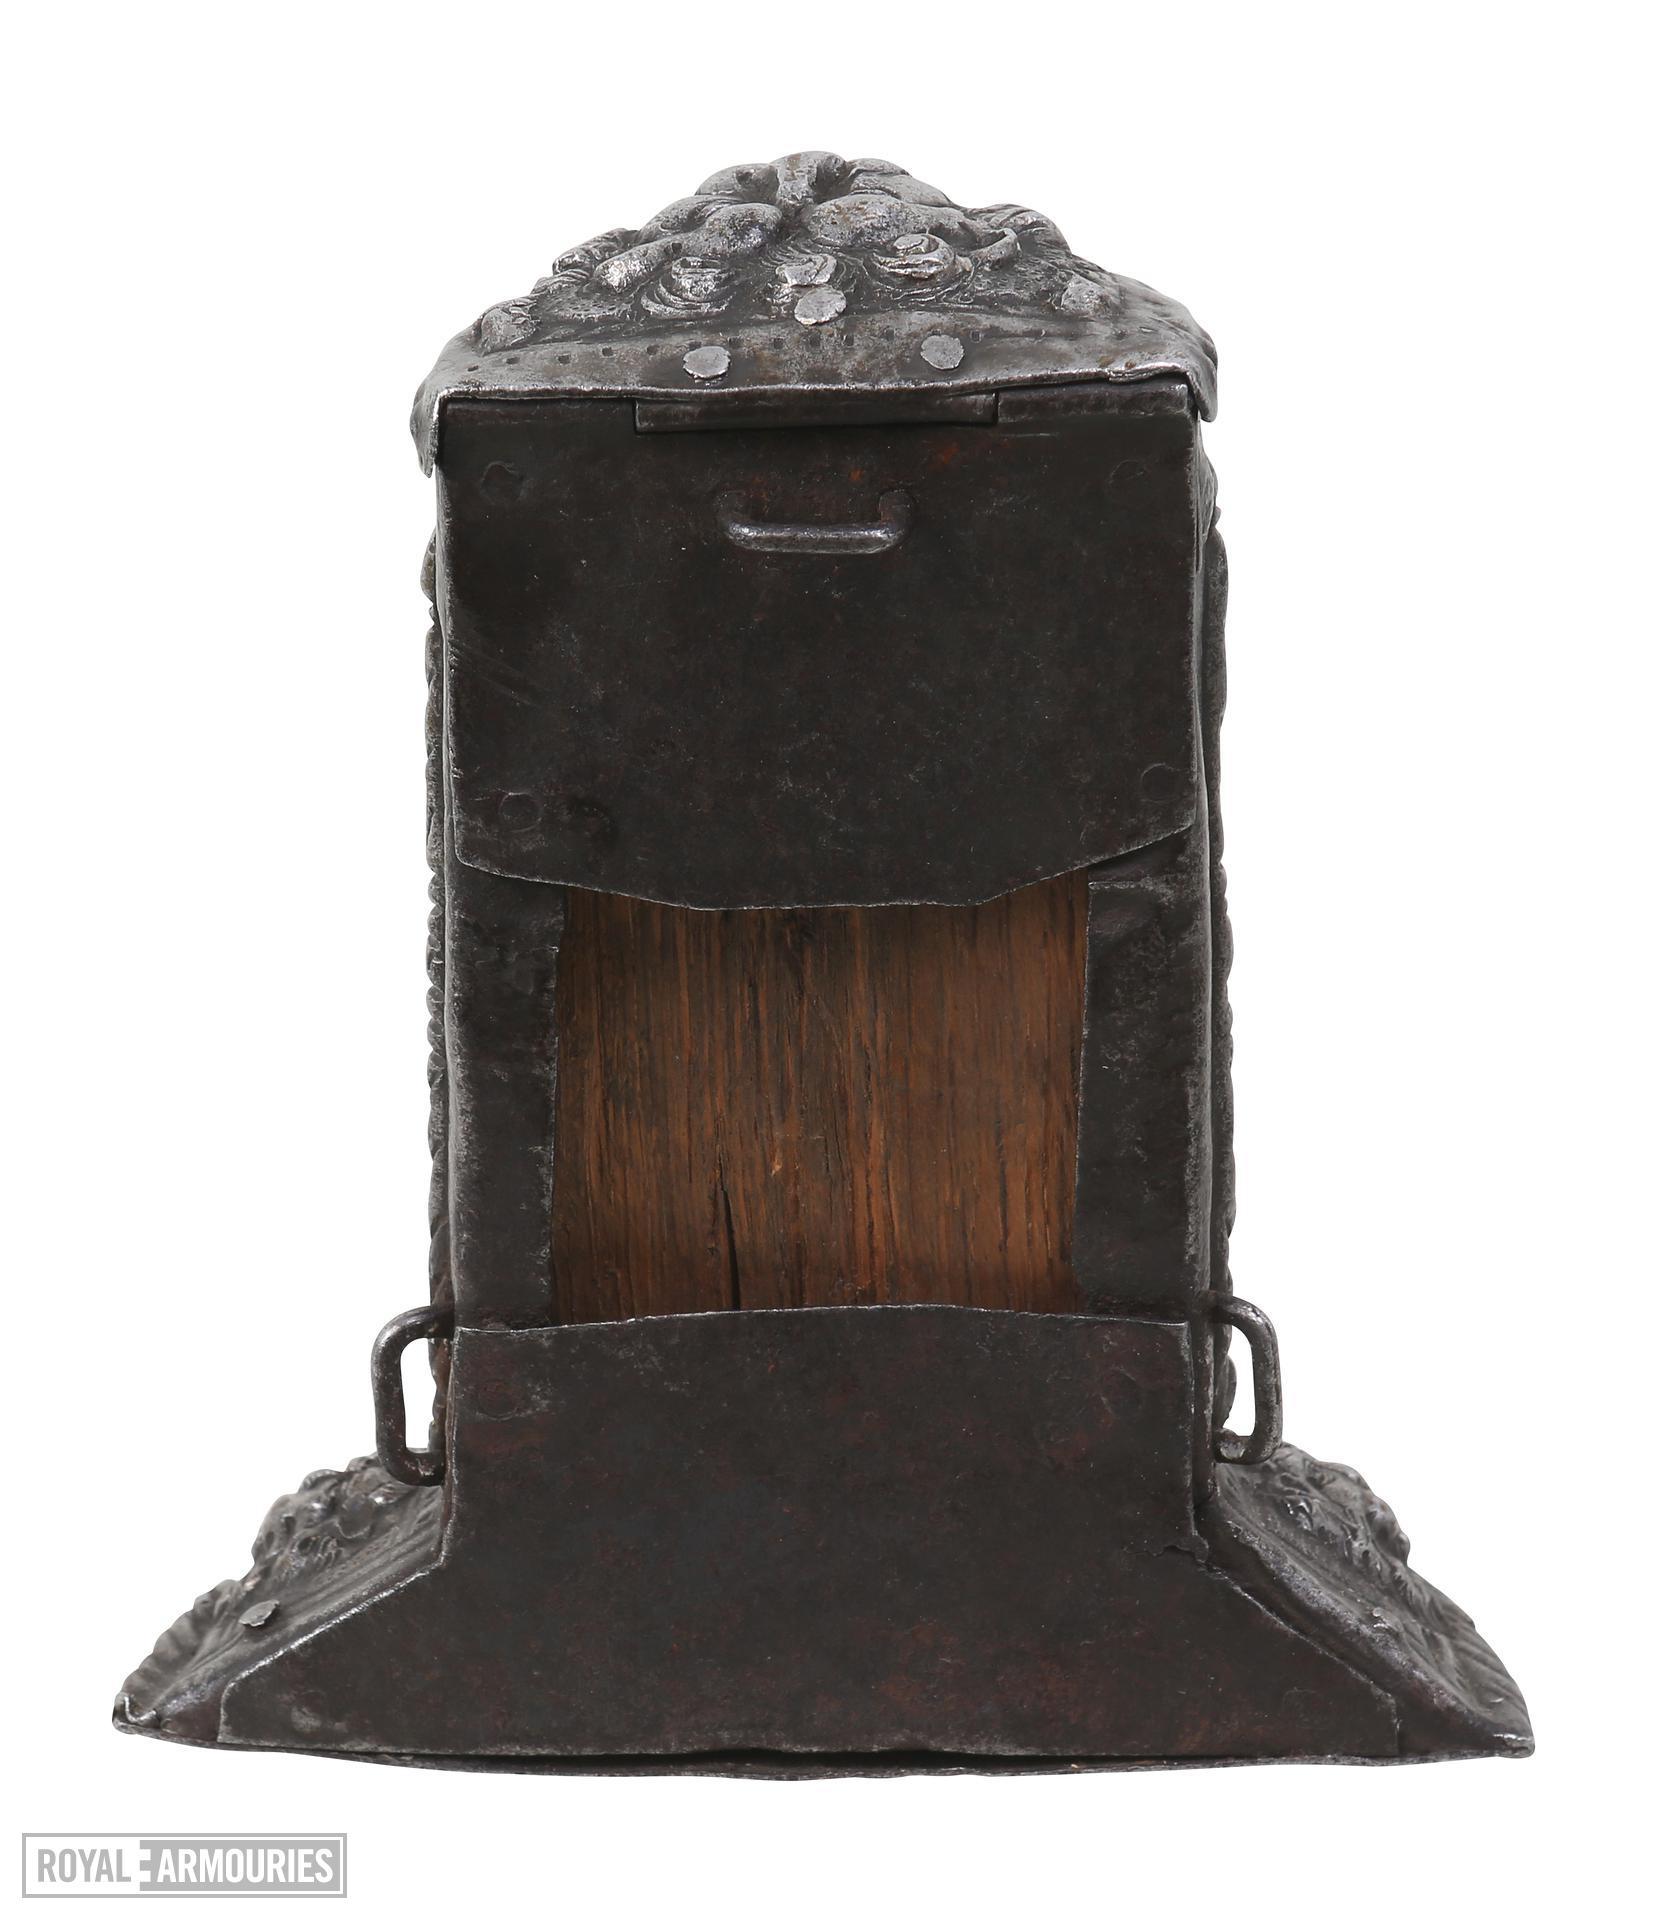 Cartridge box Brunswick type. Wooden core with embossed ferrous metal body. XIII.37